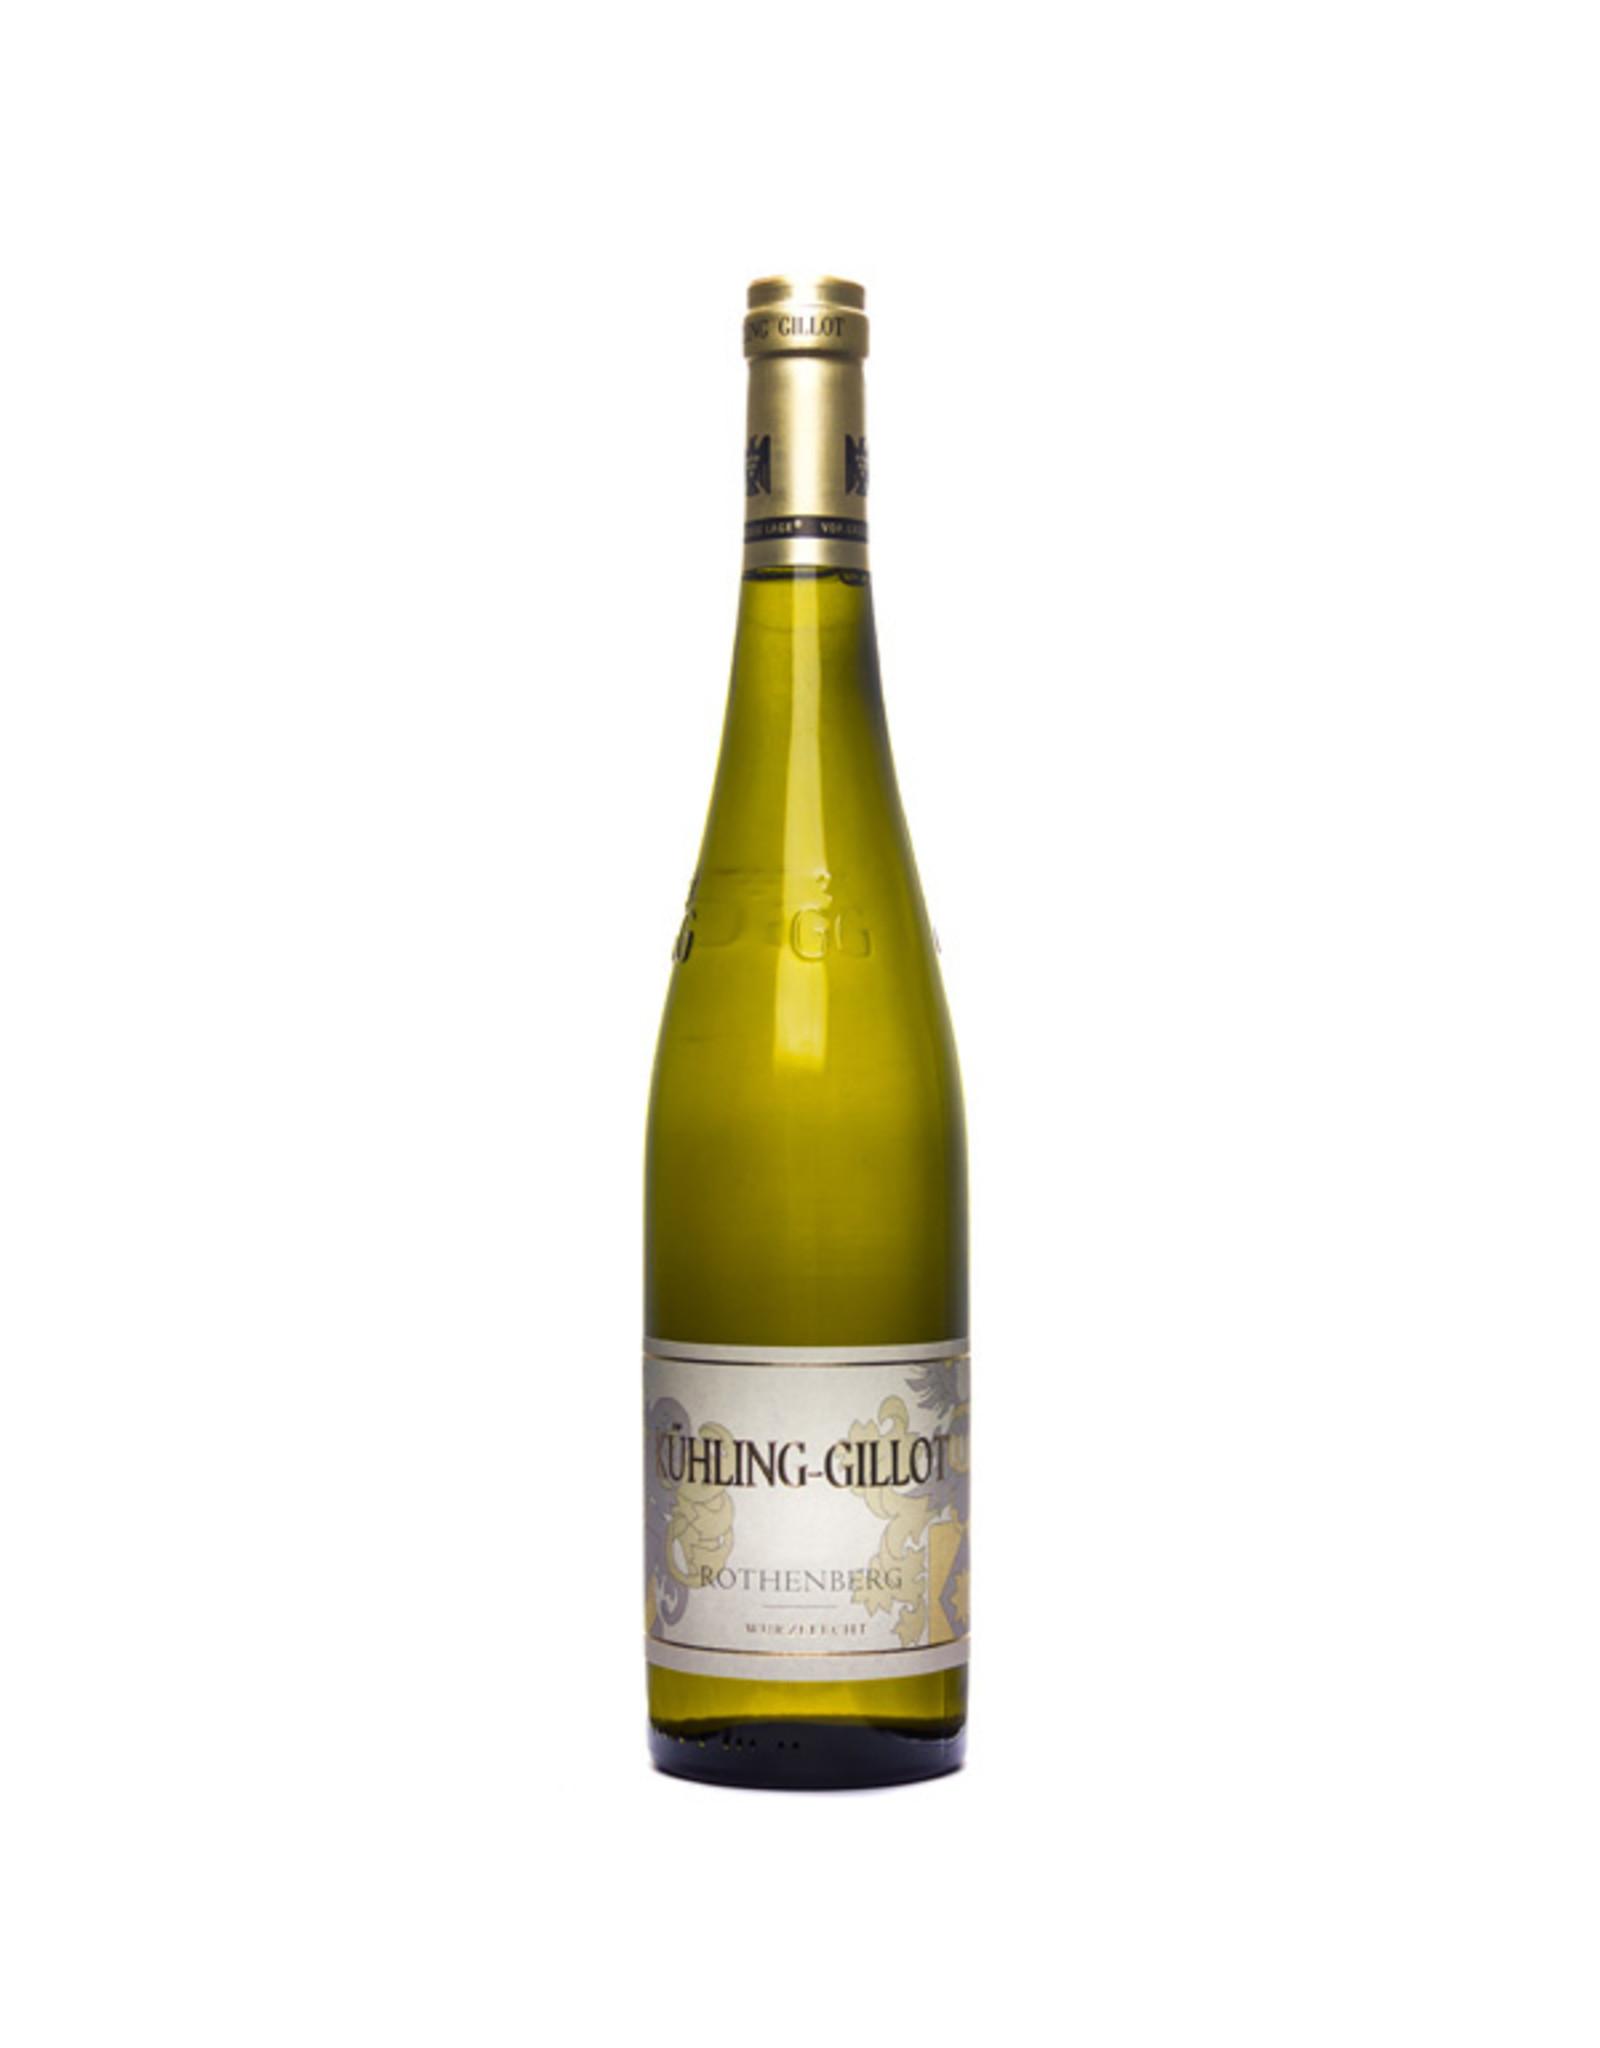 Weingut Kühling-Gillot, Bodenheim Kuhling Gillot Rothenberg GG 2015